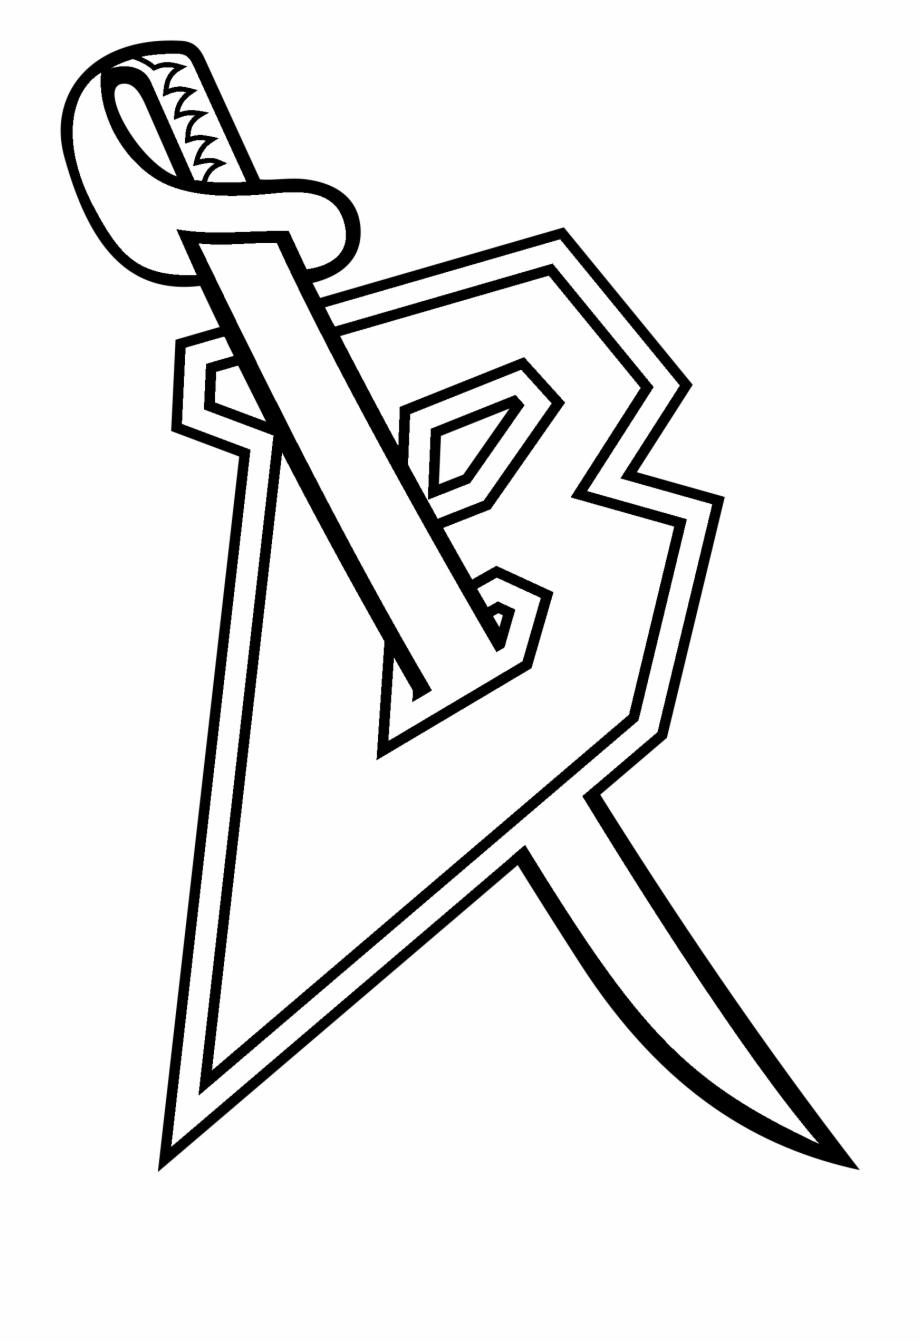 Sabres logo clipart jpg royalty free stock Buffalo Sabres Logo Black And White - Sabres Red B Logo ... jpg royalty free stock